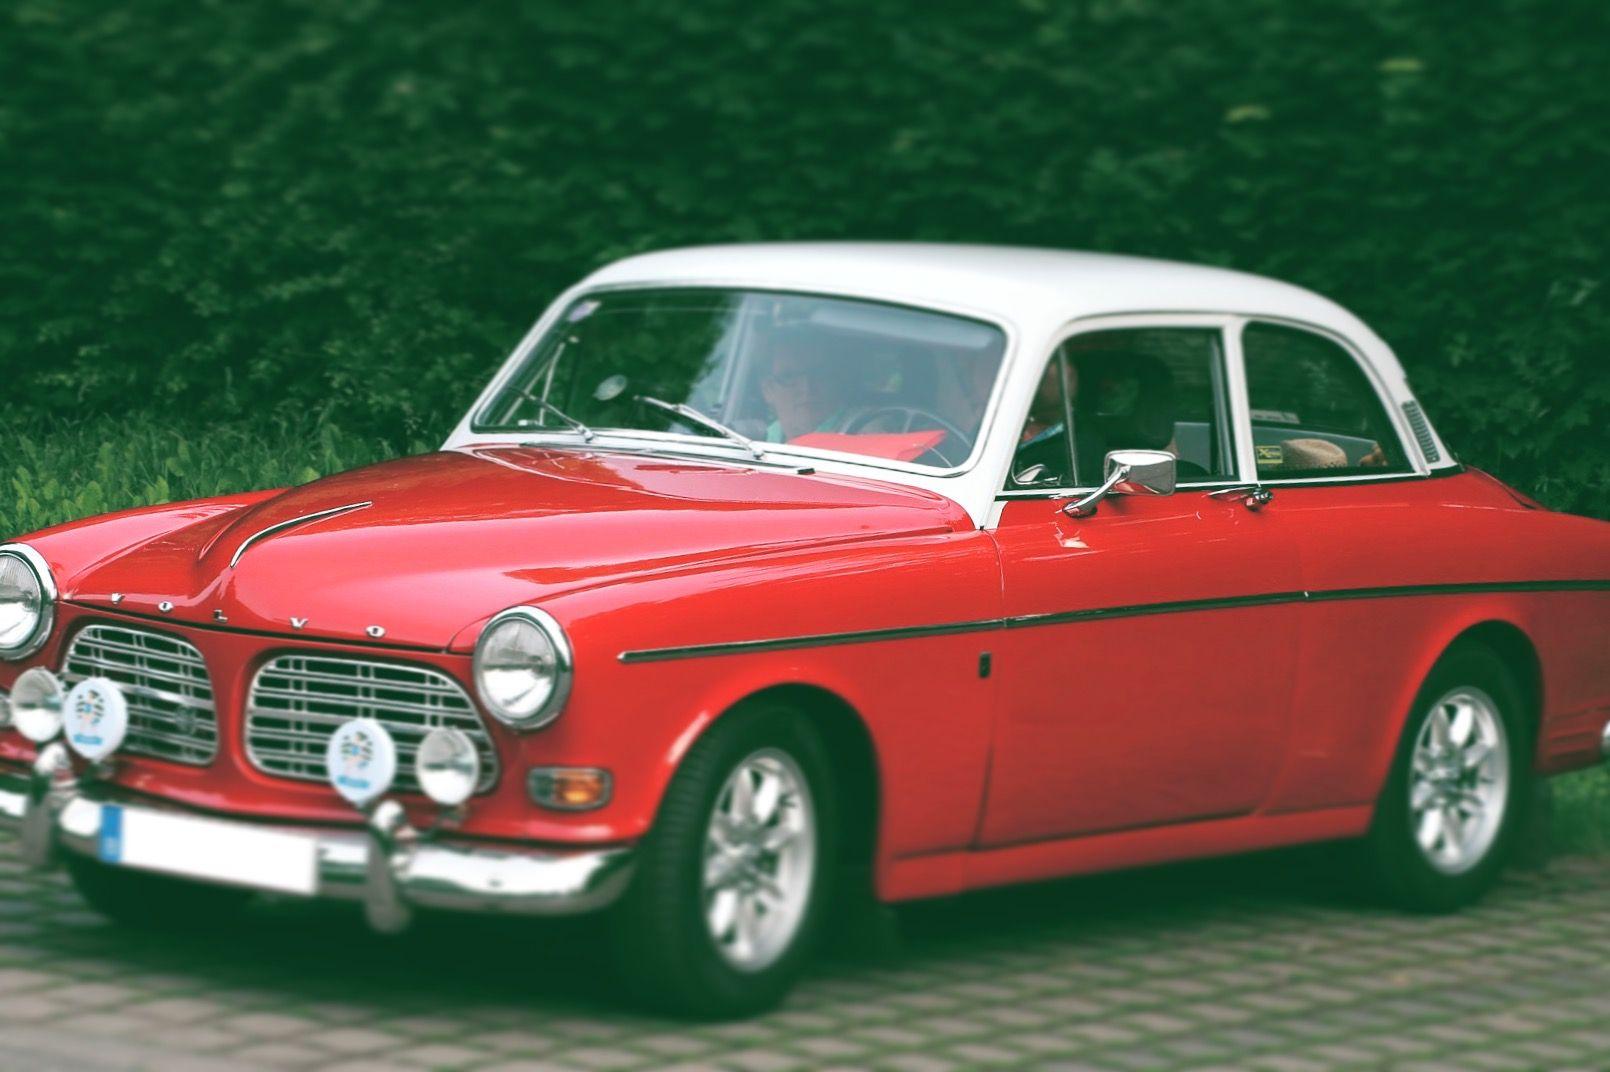 volvo #volvocars#volvonation #classic #classiccar #classiccars ...